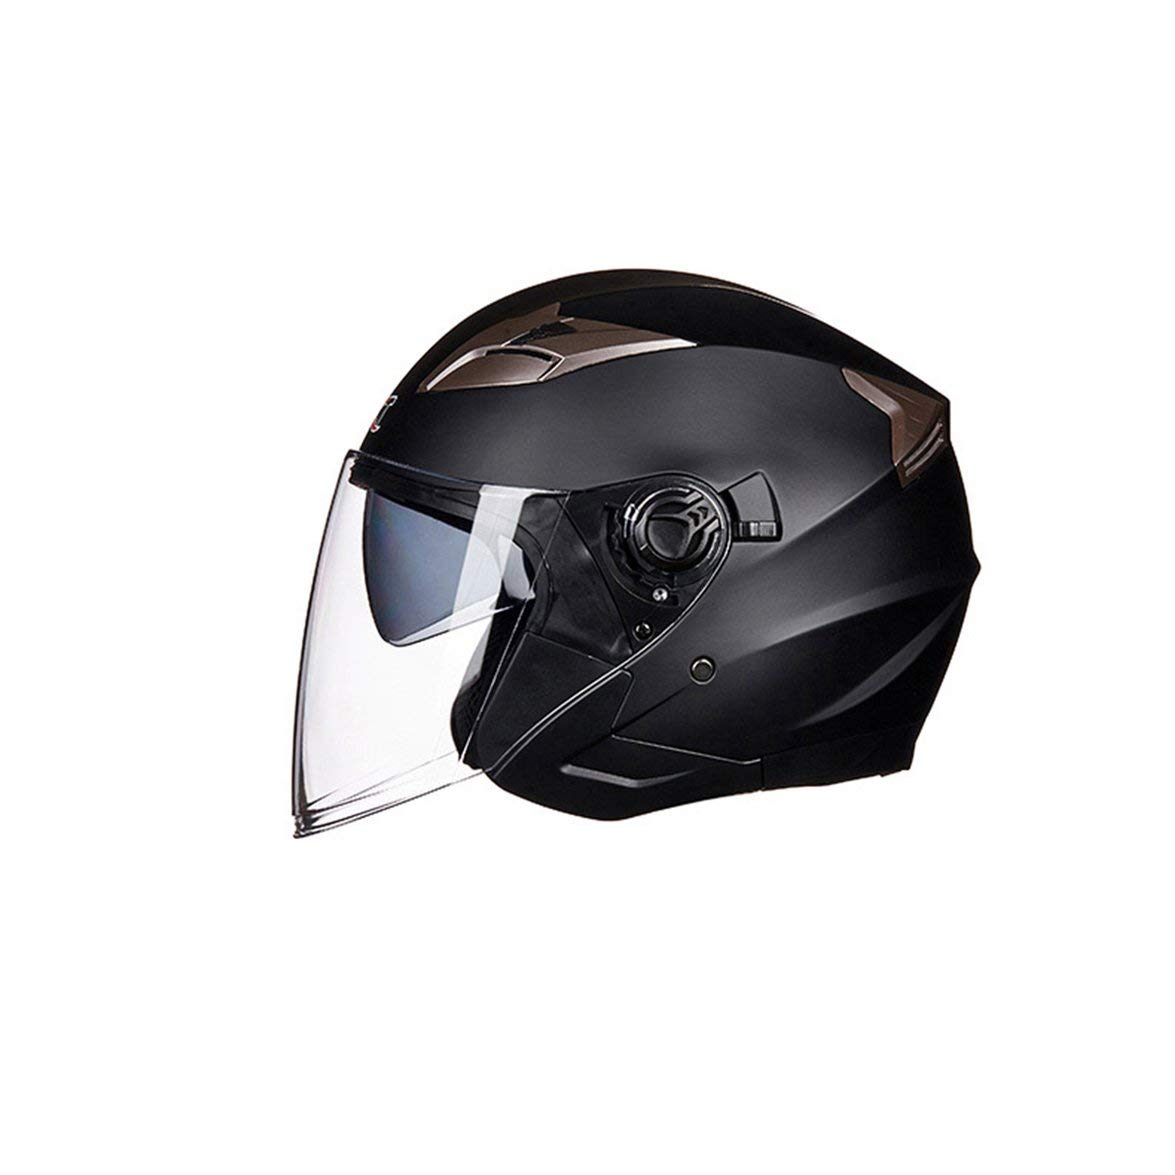 Kongqiabona Casco Moto Moto Open Face Ciclomotore Jet Bobber Helmet Pilot per Adulti